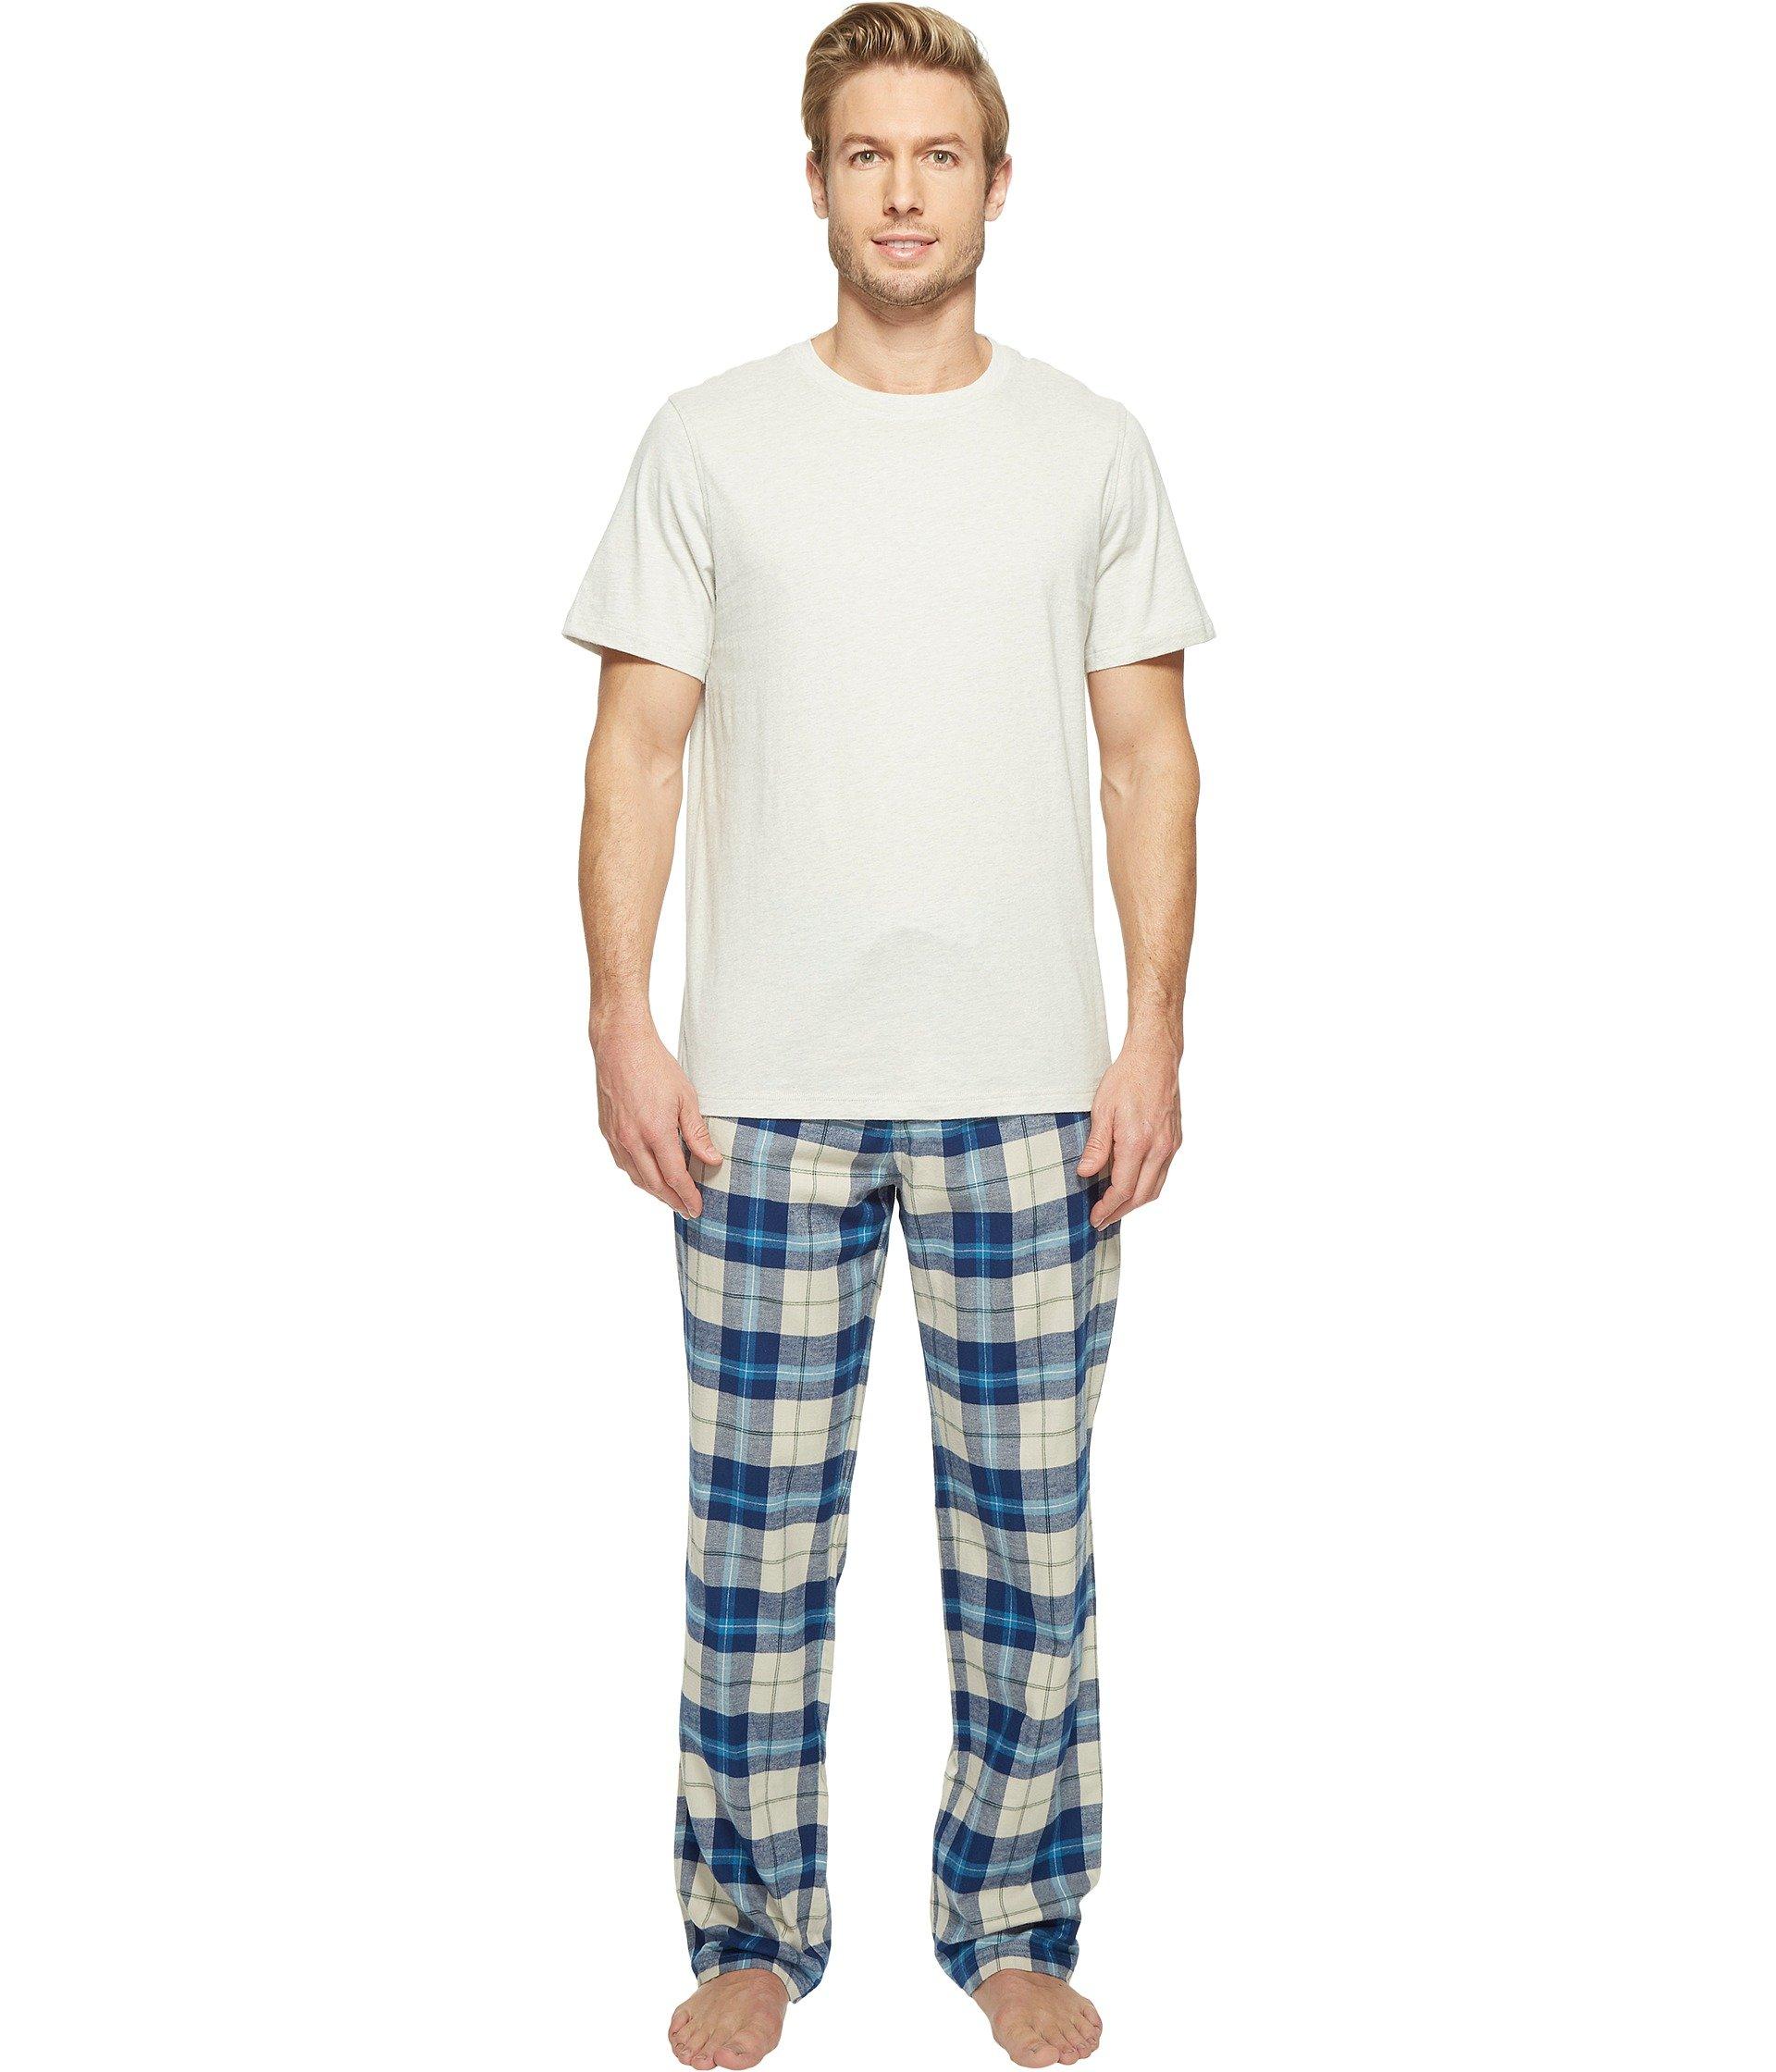 Pijama para Hombre UGG Grant Plaid PJ Set  + UGG en VeoyCompro.net